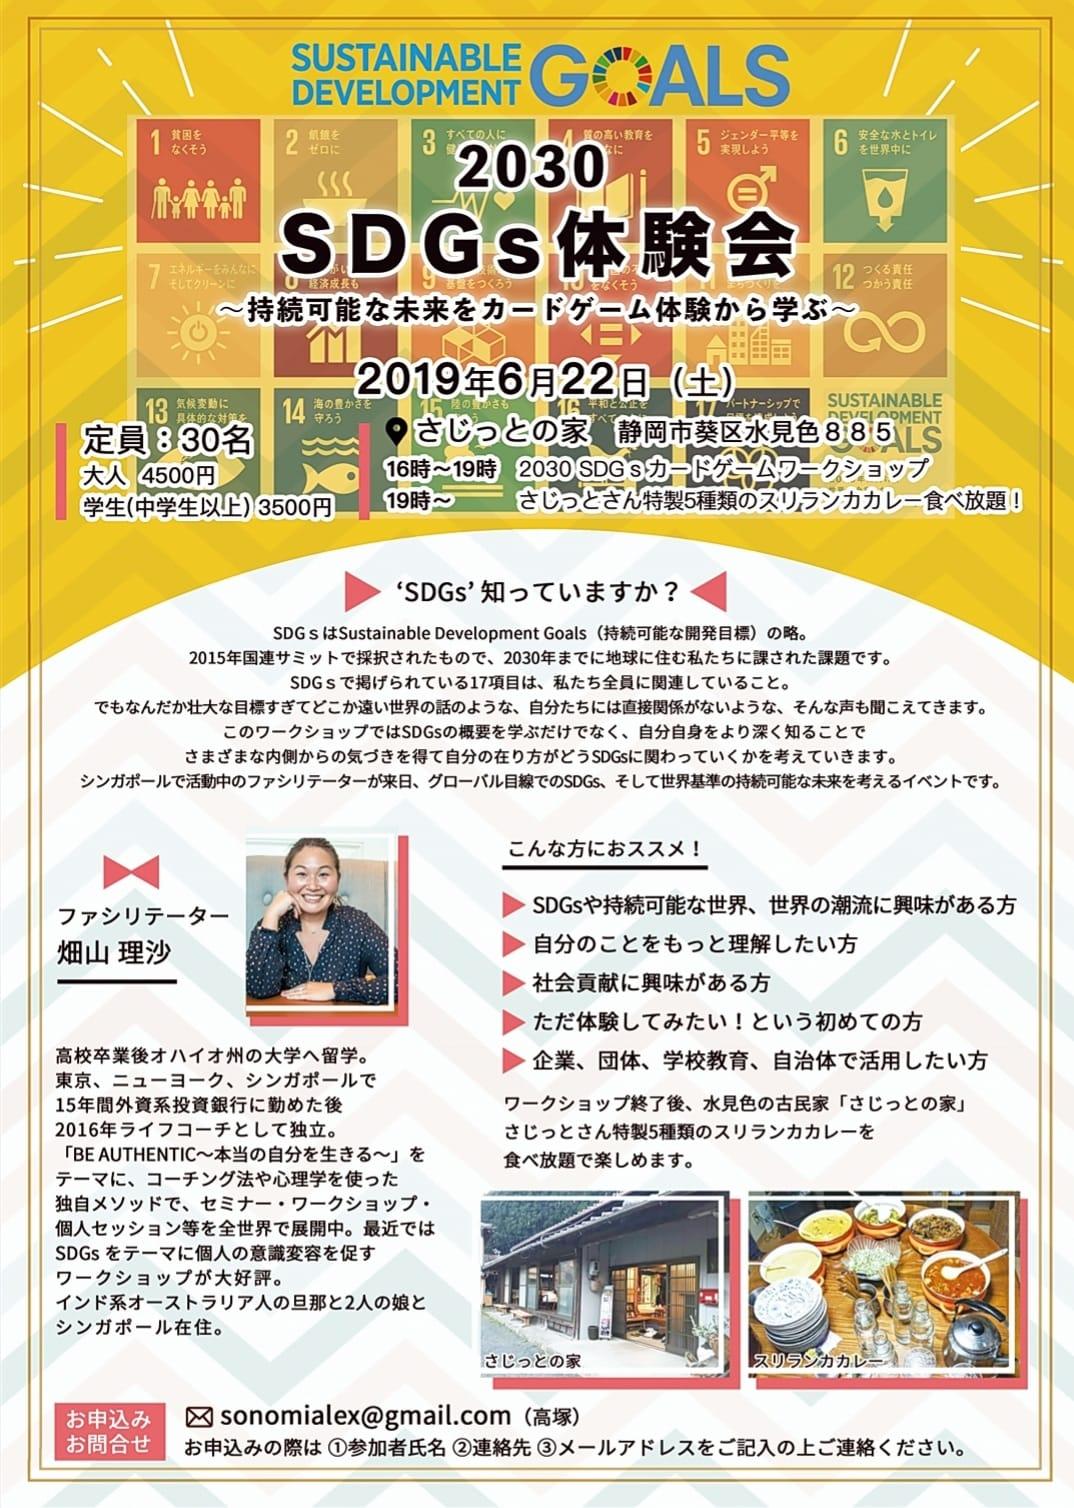 2030 SDGs体験会 ~持続可能な未来をカードゲーム体験から学ぶ~